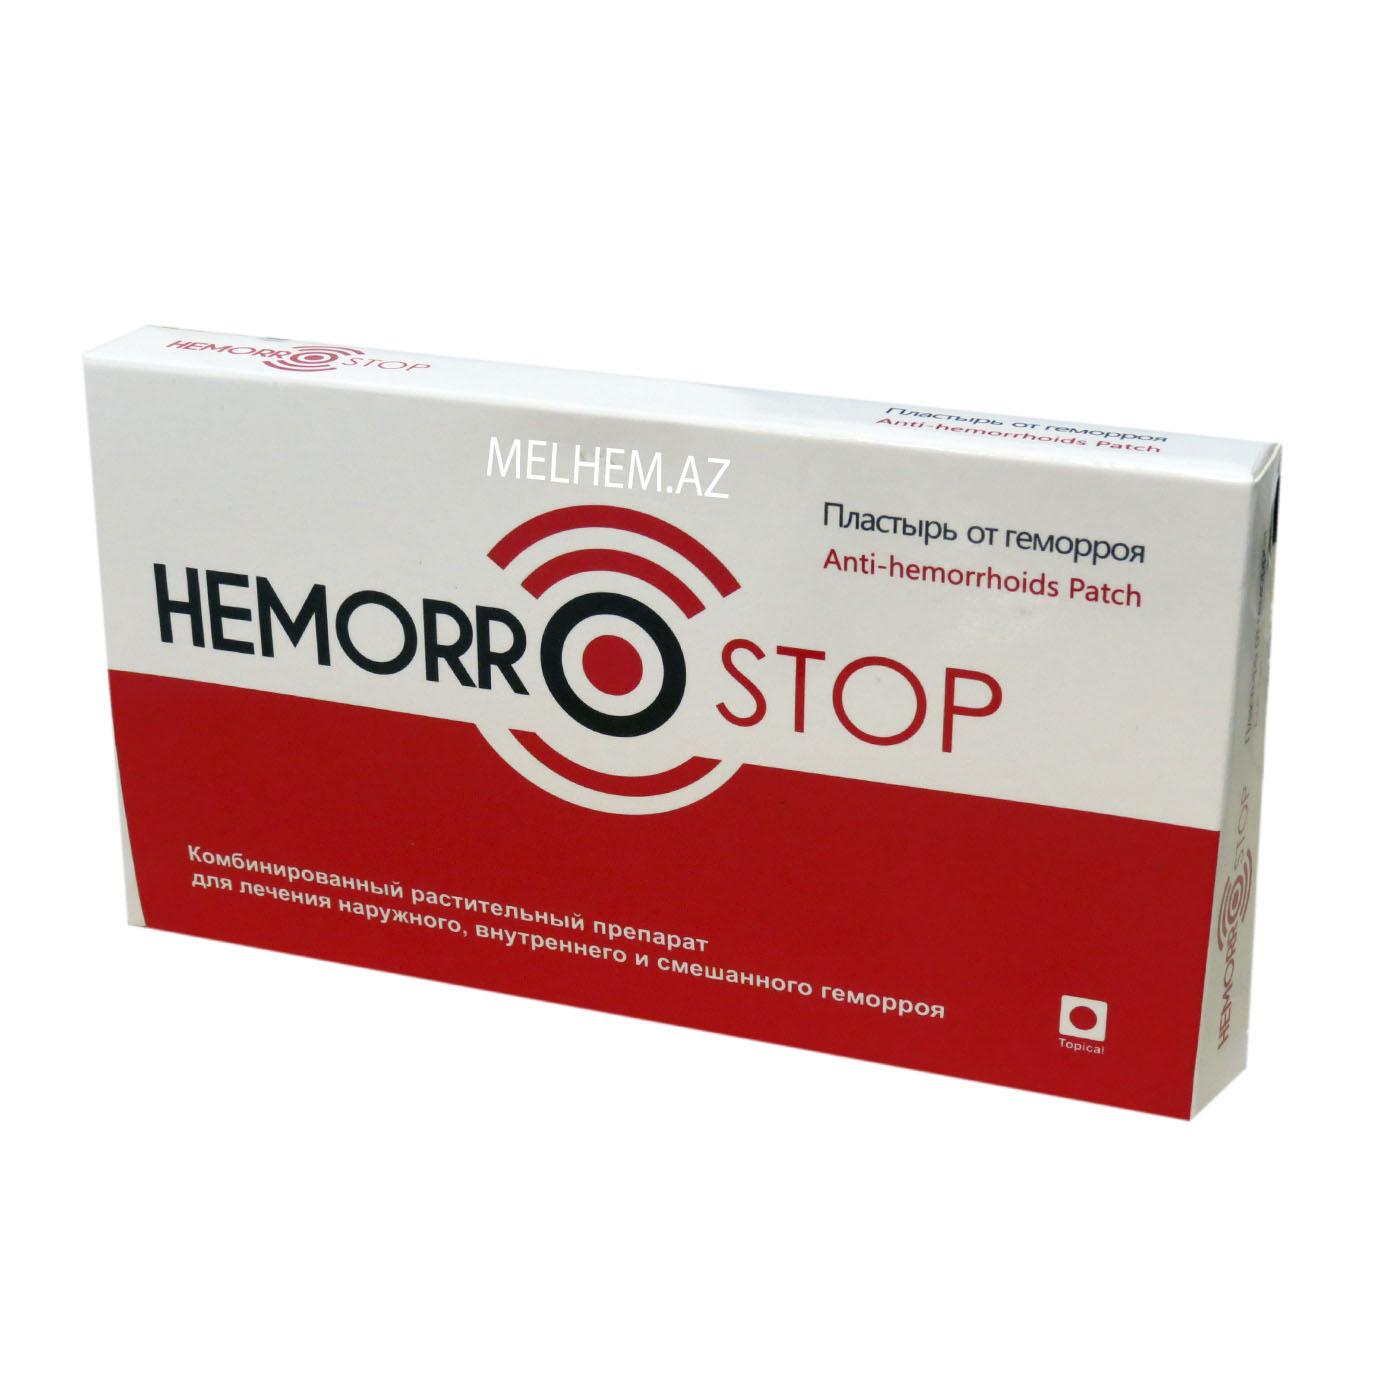 HEMORRO STOP N4